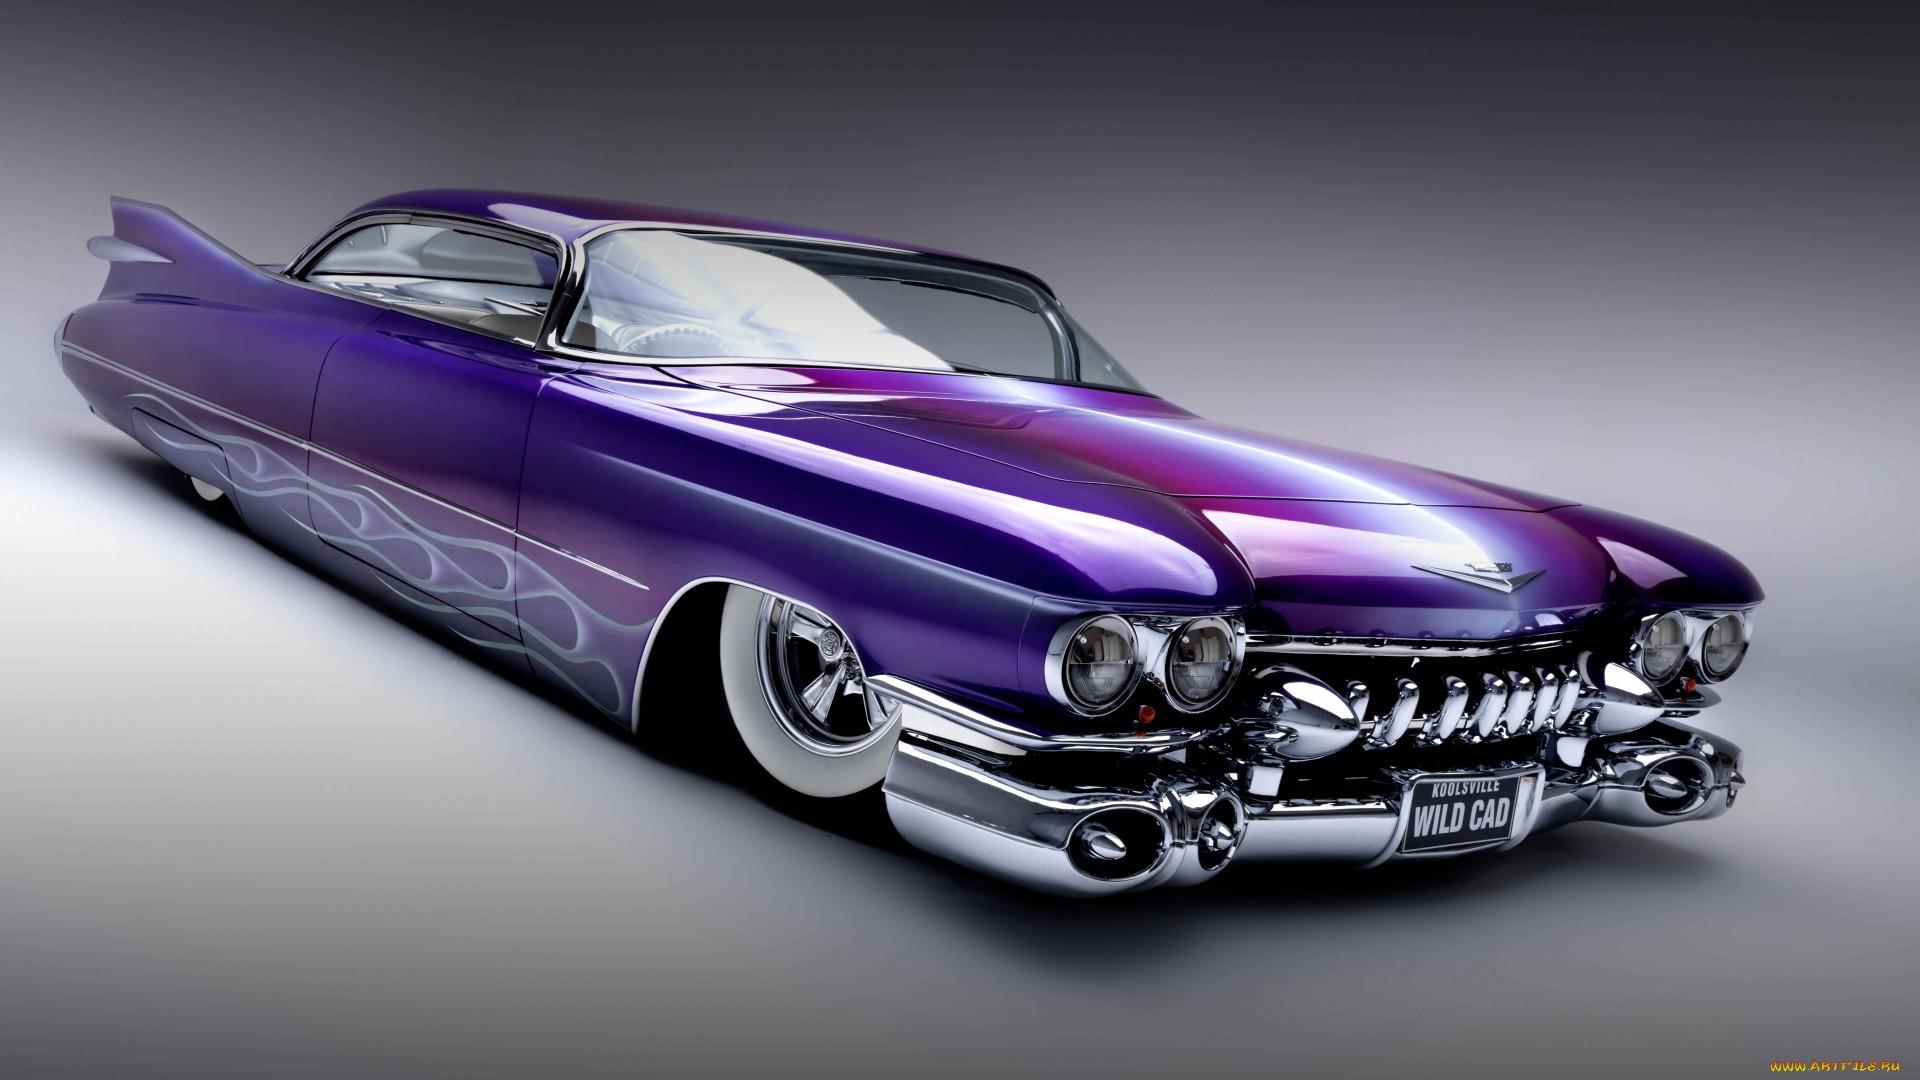 Cadillac lowrider custom classic wallpaper 1920x1080 71417 1920x1080